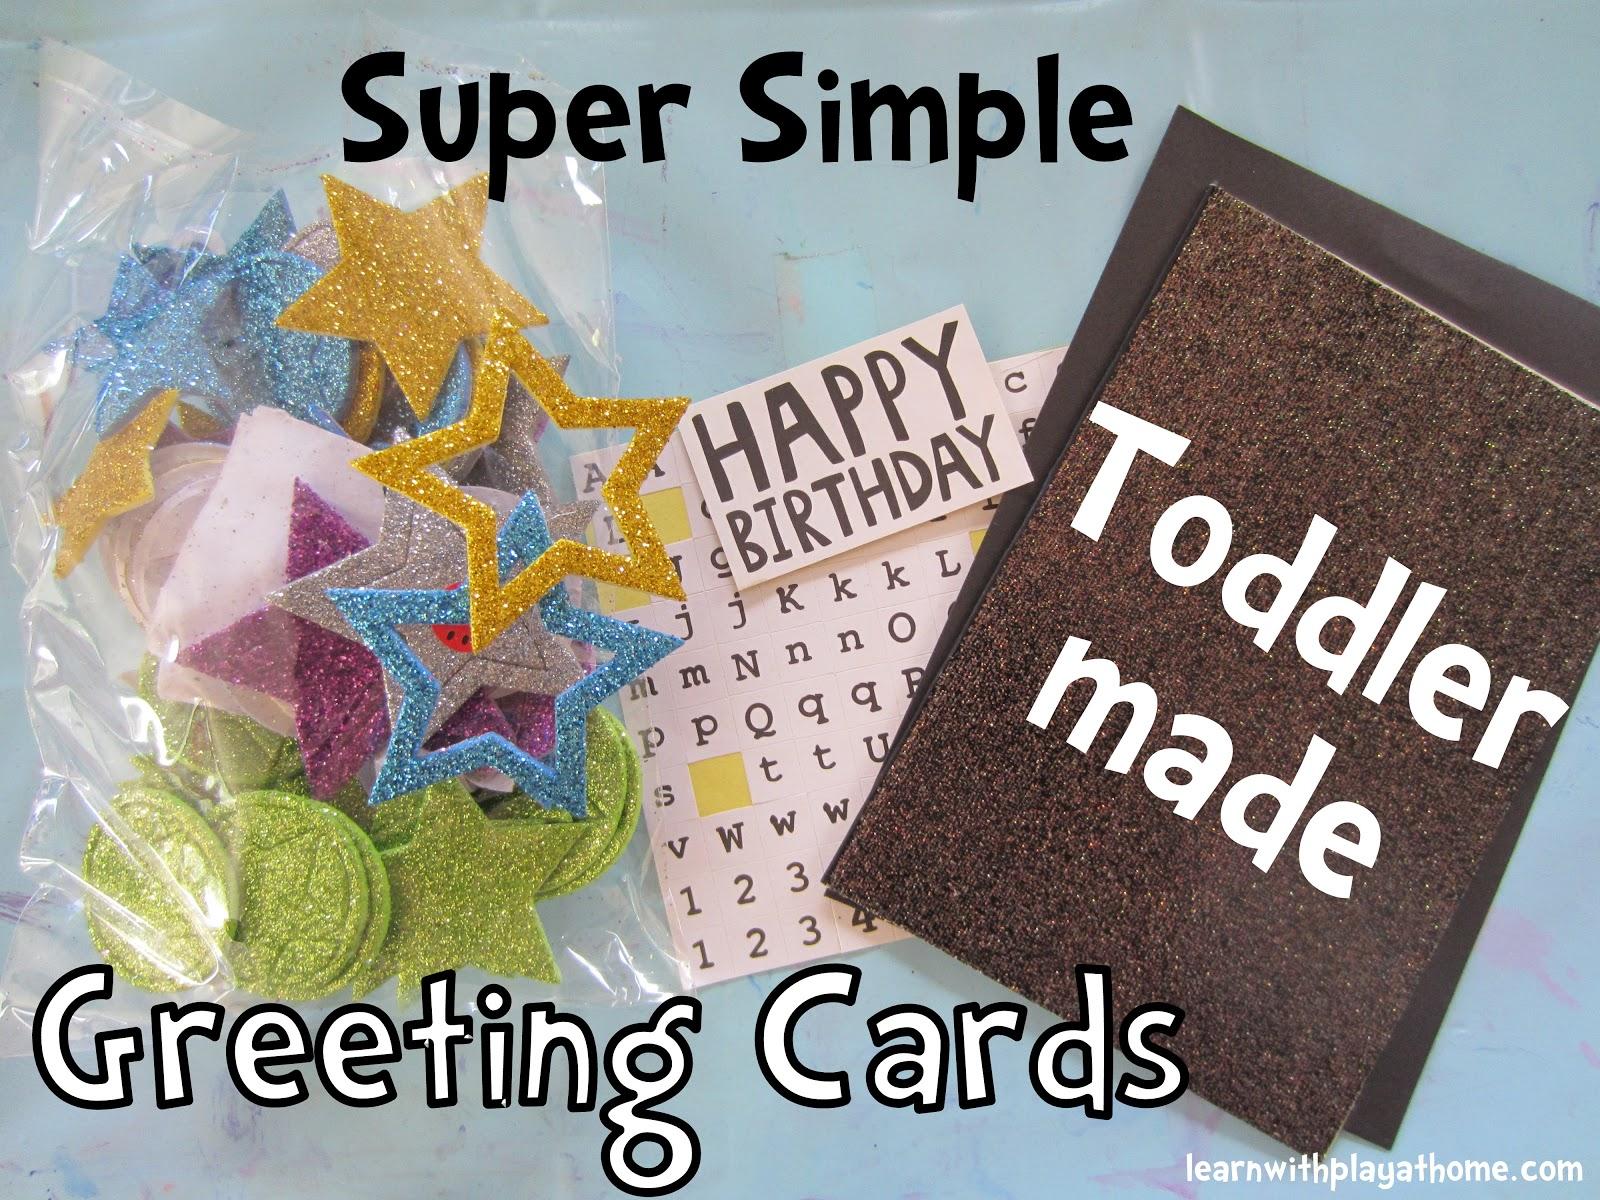 Nov 15 2012 Why Buy Greeting Cards